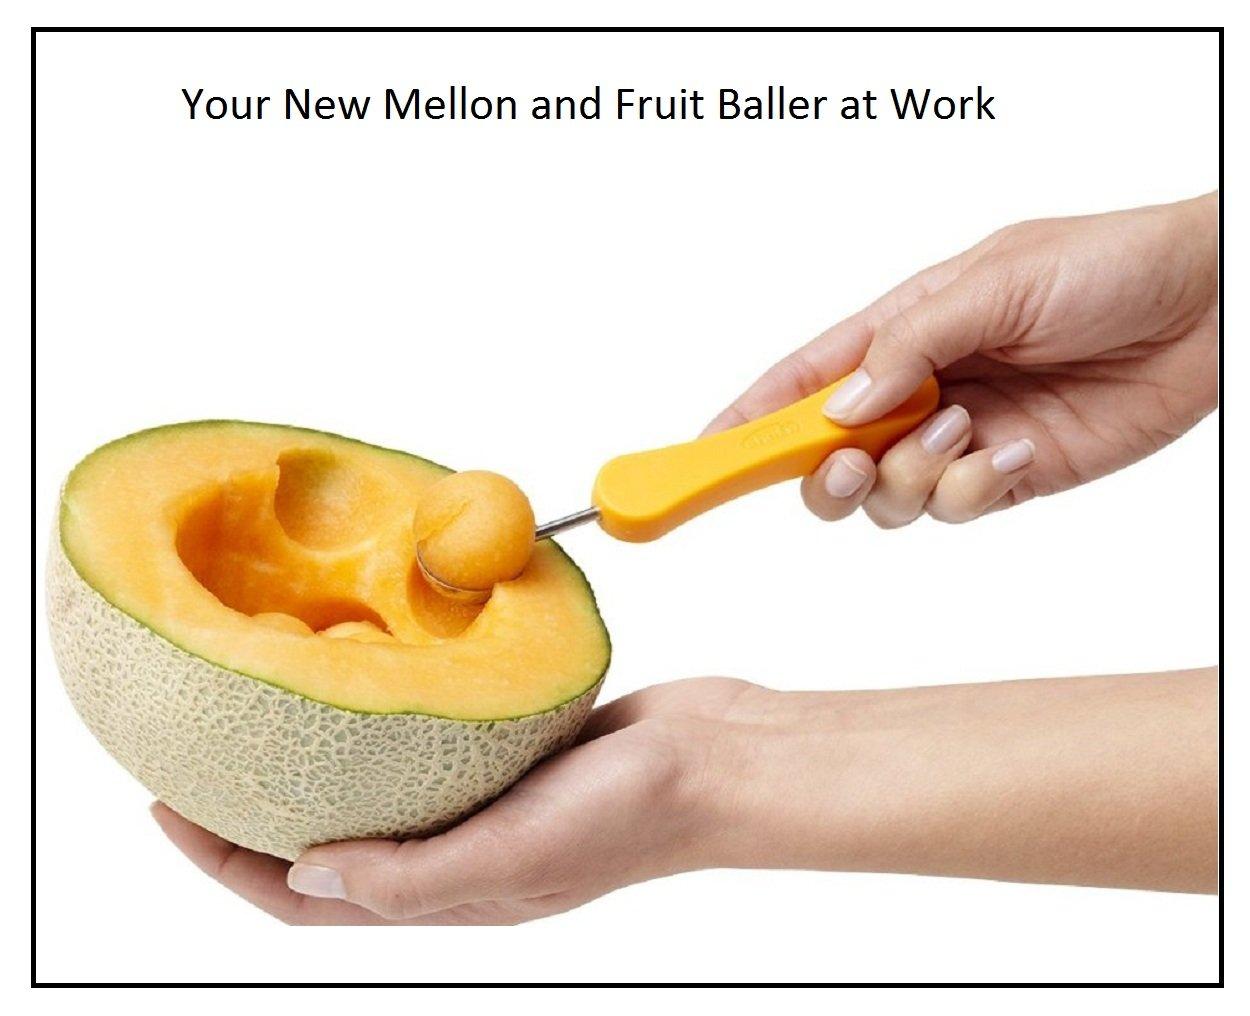 3 in1 Melon Baller Scoops Ice Cream Spoon Fruit Peeler New Best Mellon Baller and Fruit Scoop